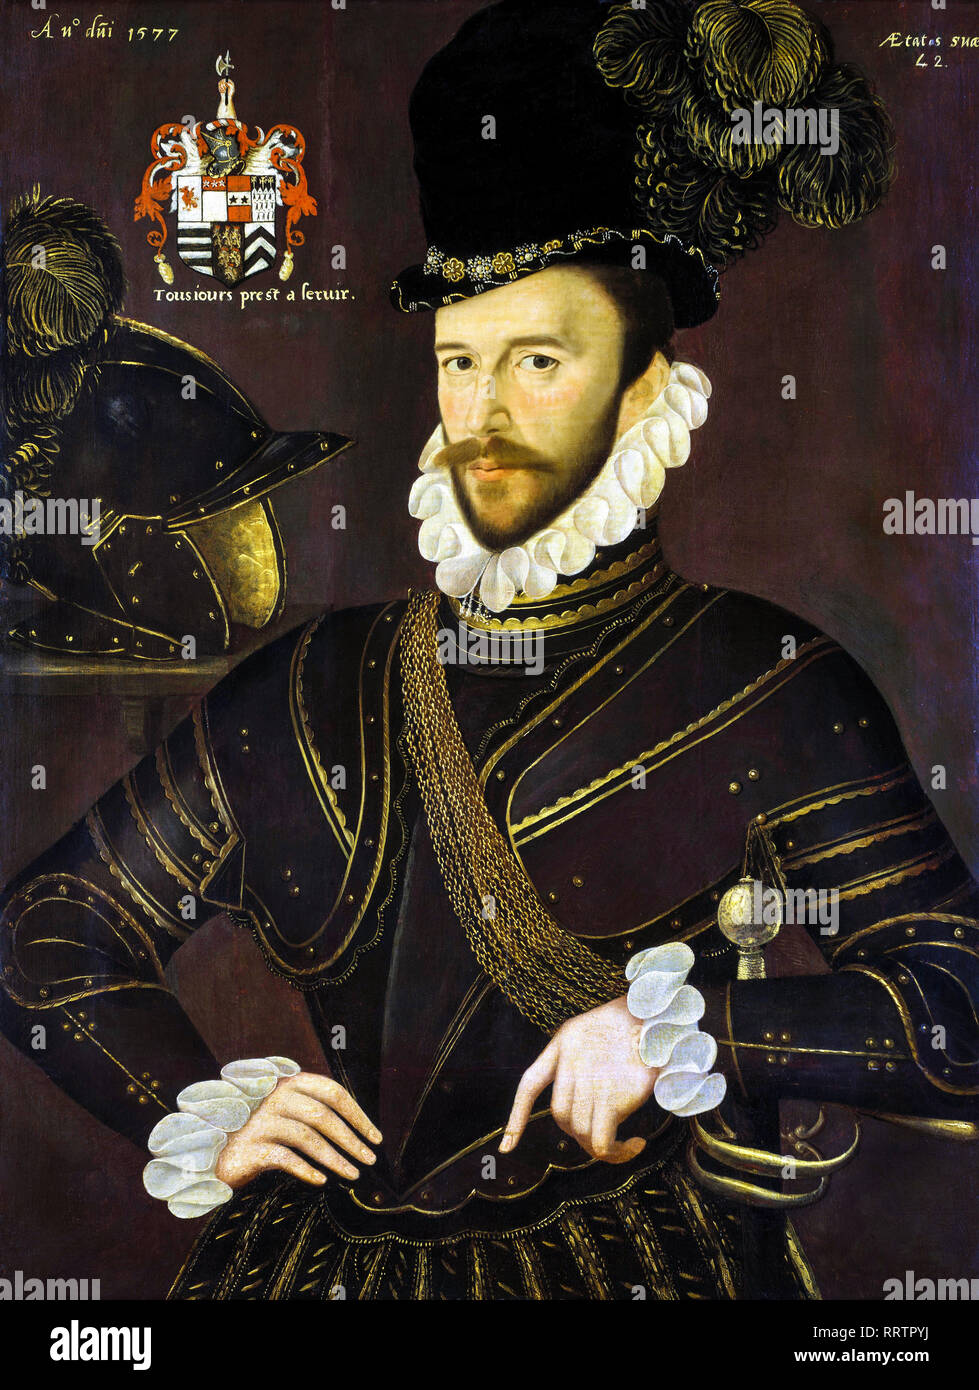 Richard Drake (1535-1603), portrait painting, circa 1577 - Stock Image